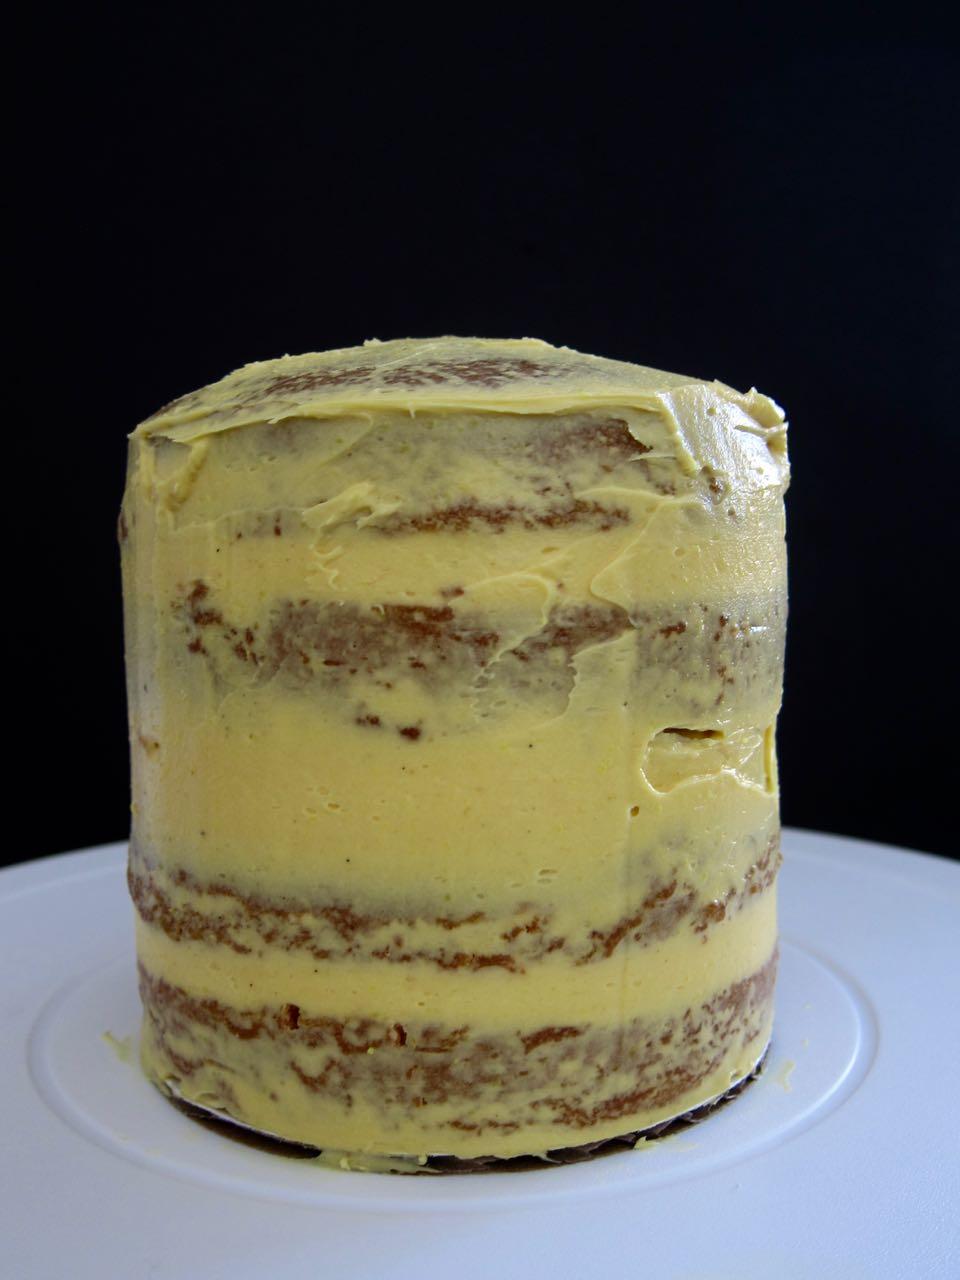 Bride & Prejudice Cake Crumb Coat.jpg